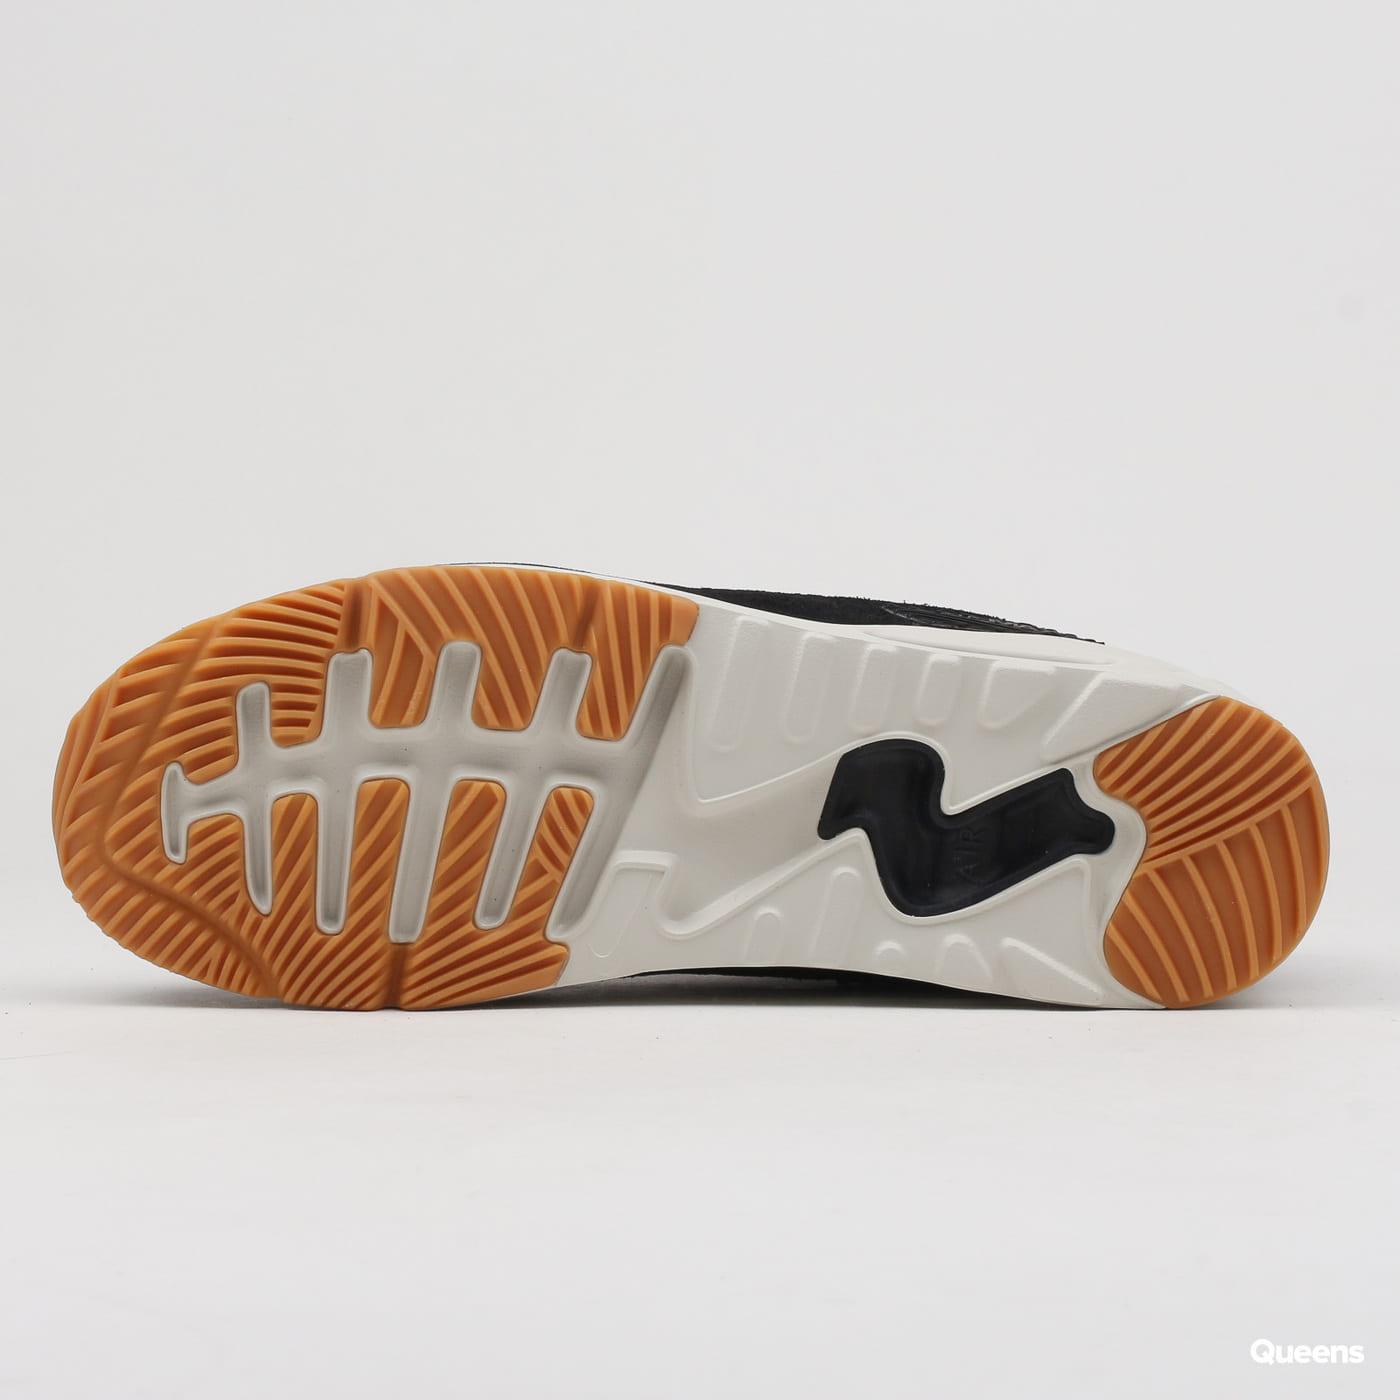 ed7e874df2 Zoom in Zoom in Zoom in Zoom in Zoom in. Nike Air Max 90 Ultra 2.0 Leather  black ...